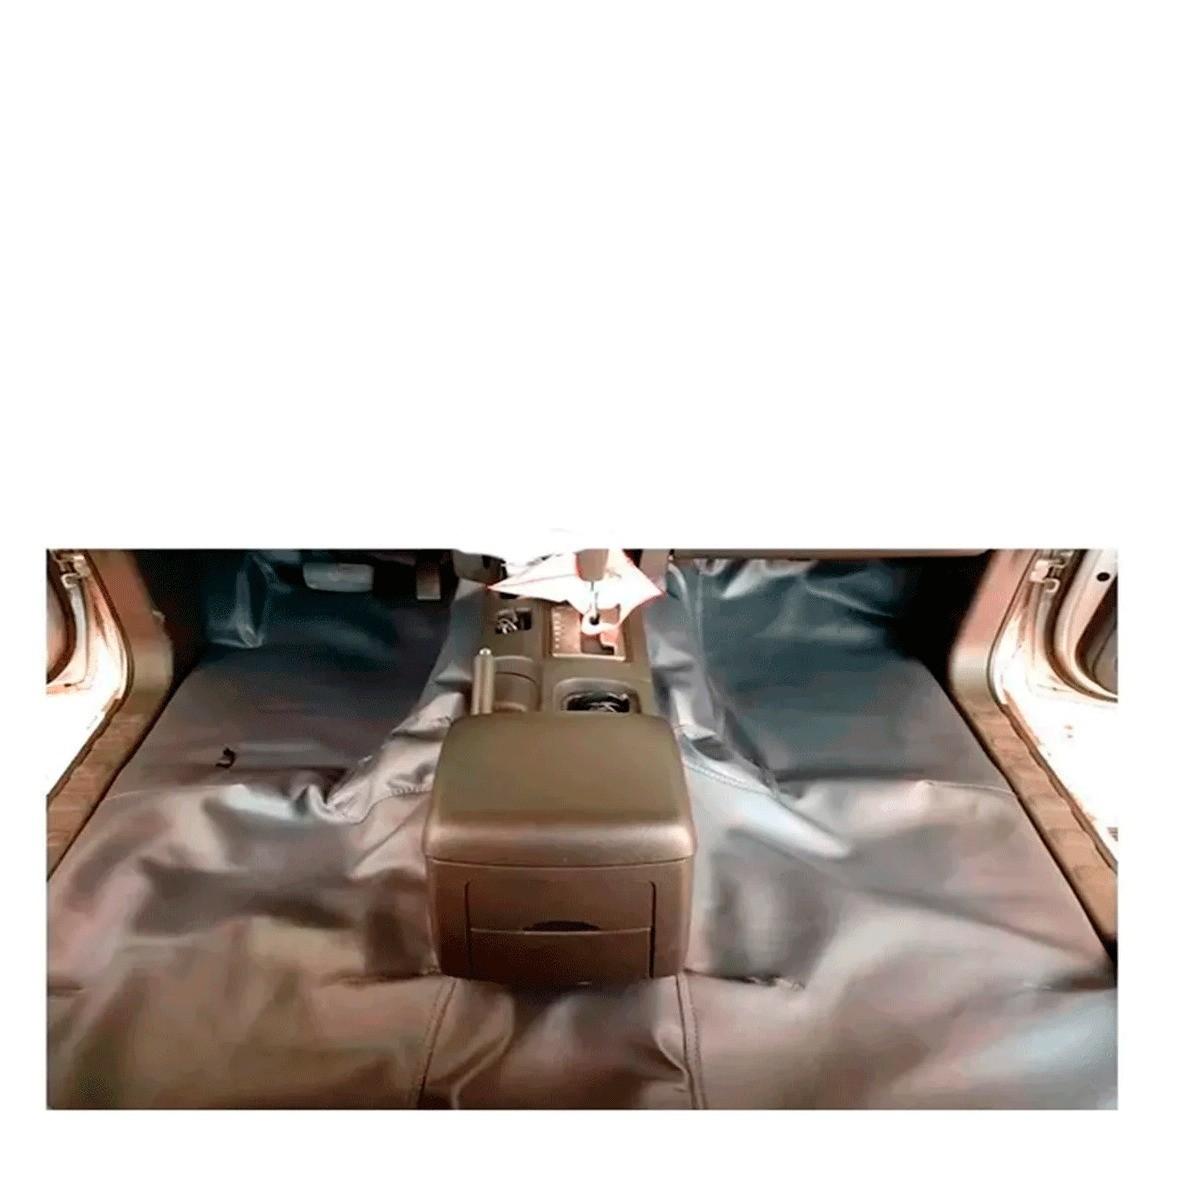 Tapete Automotivo Assoalho Emborrachado Bidim Volkswagen Gol BOLA G2 G3 2 PORTAS